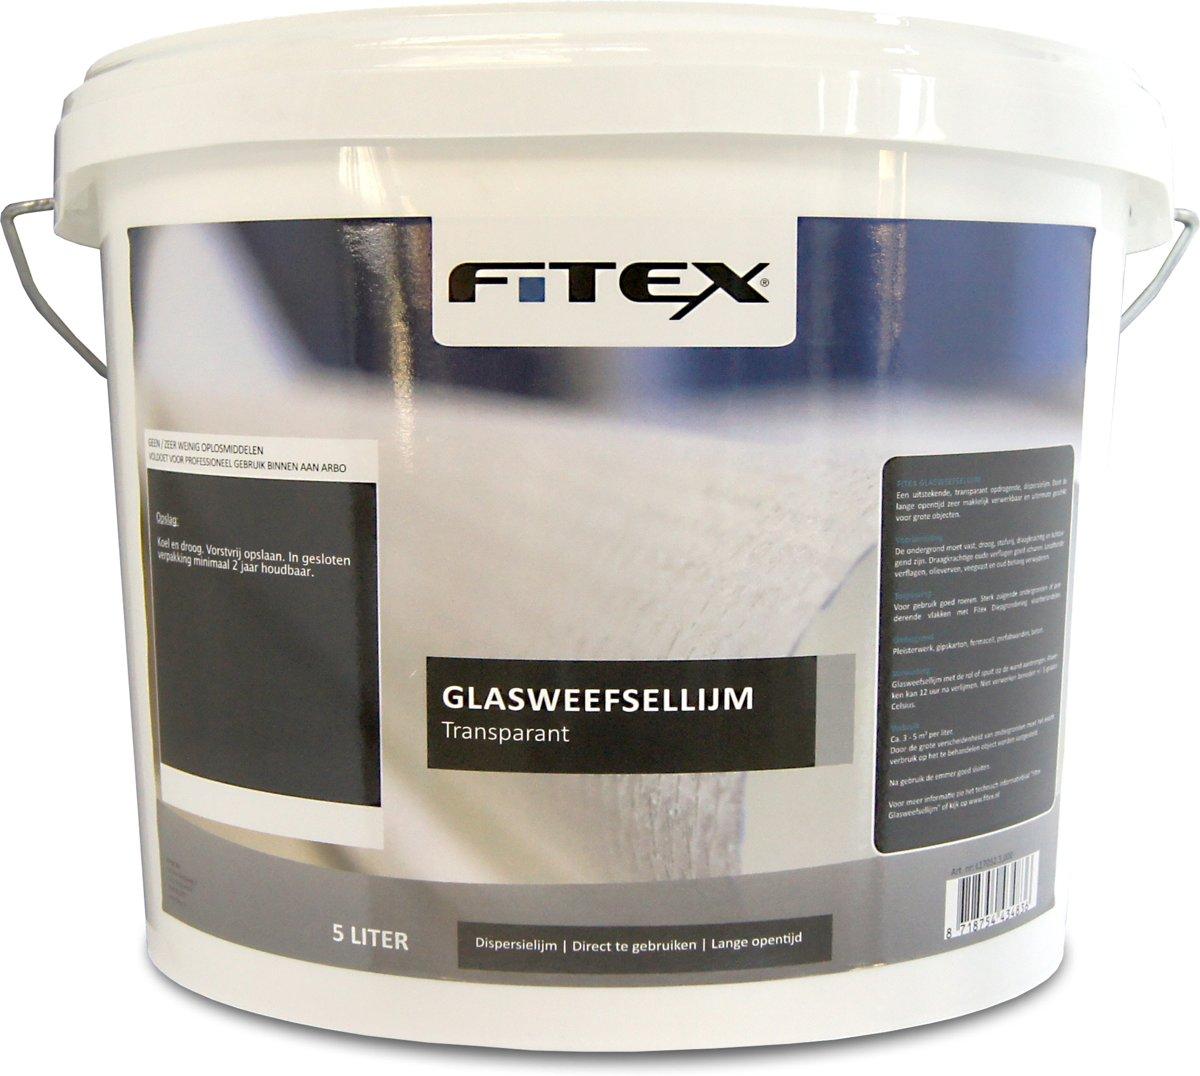 Fitex Glasweefsellijm transparant 5 liter kopen